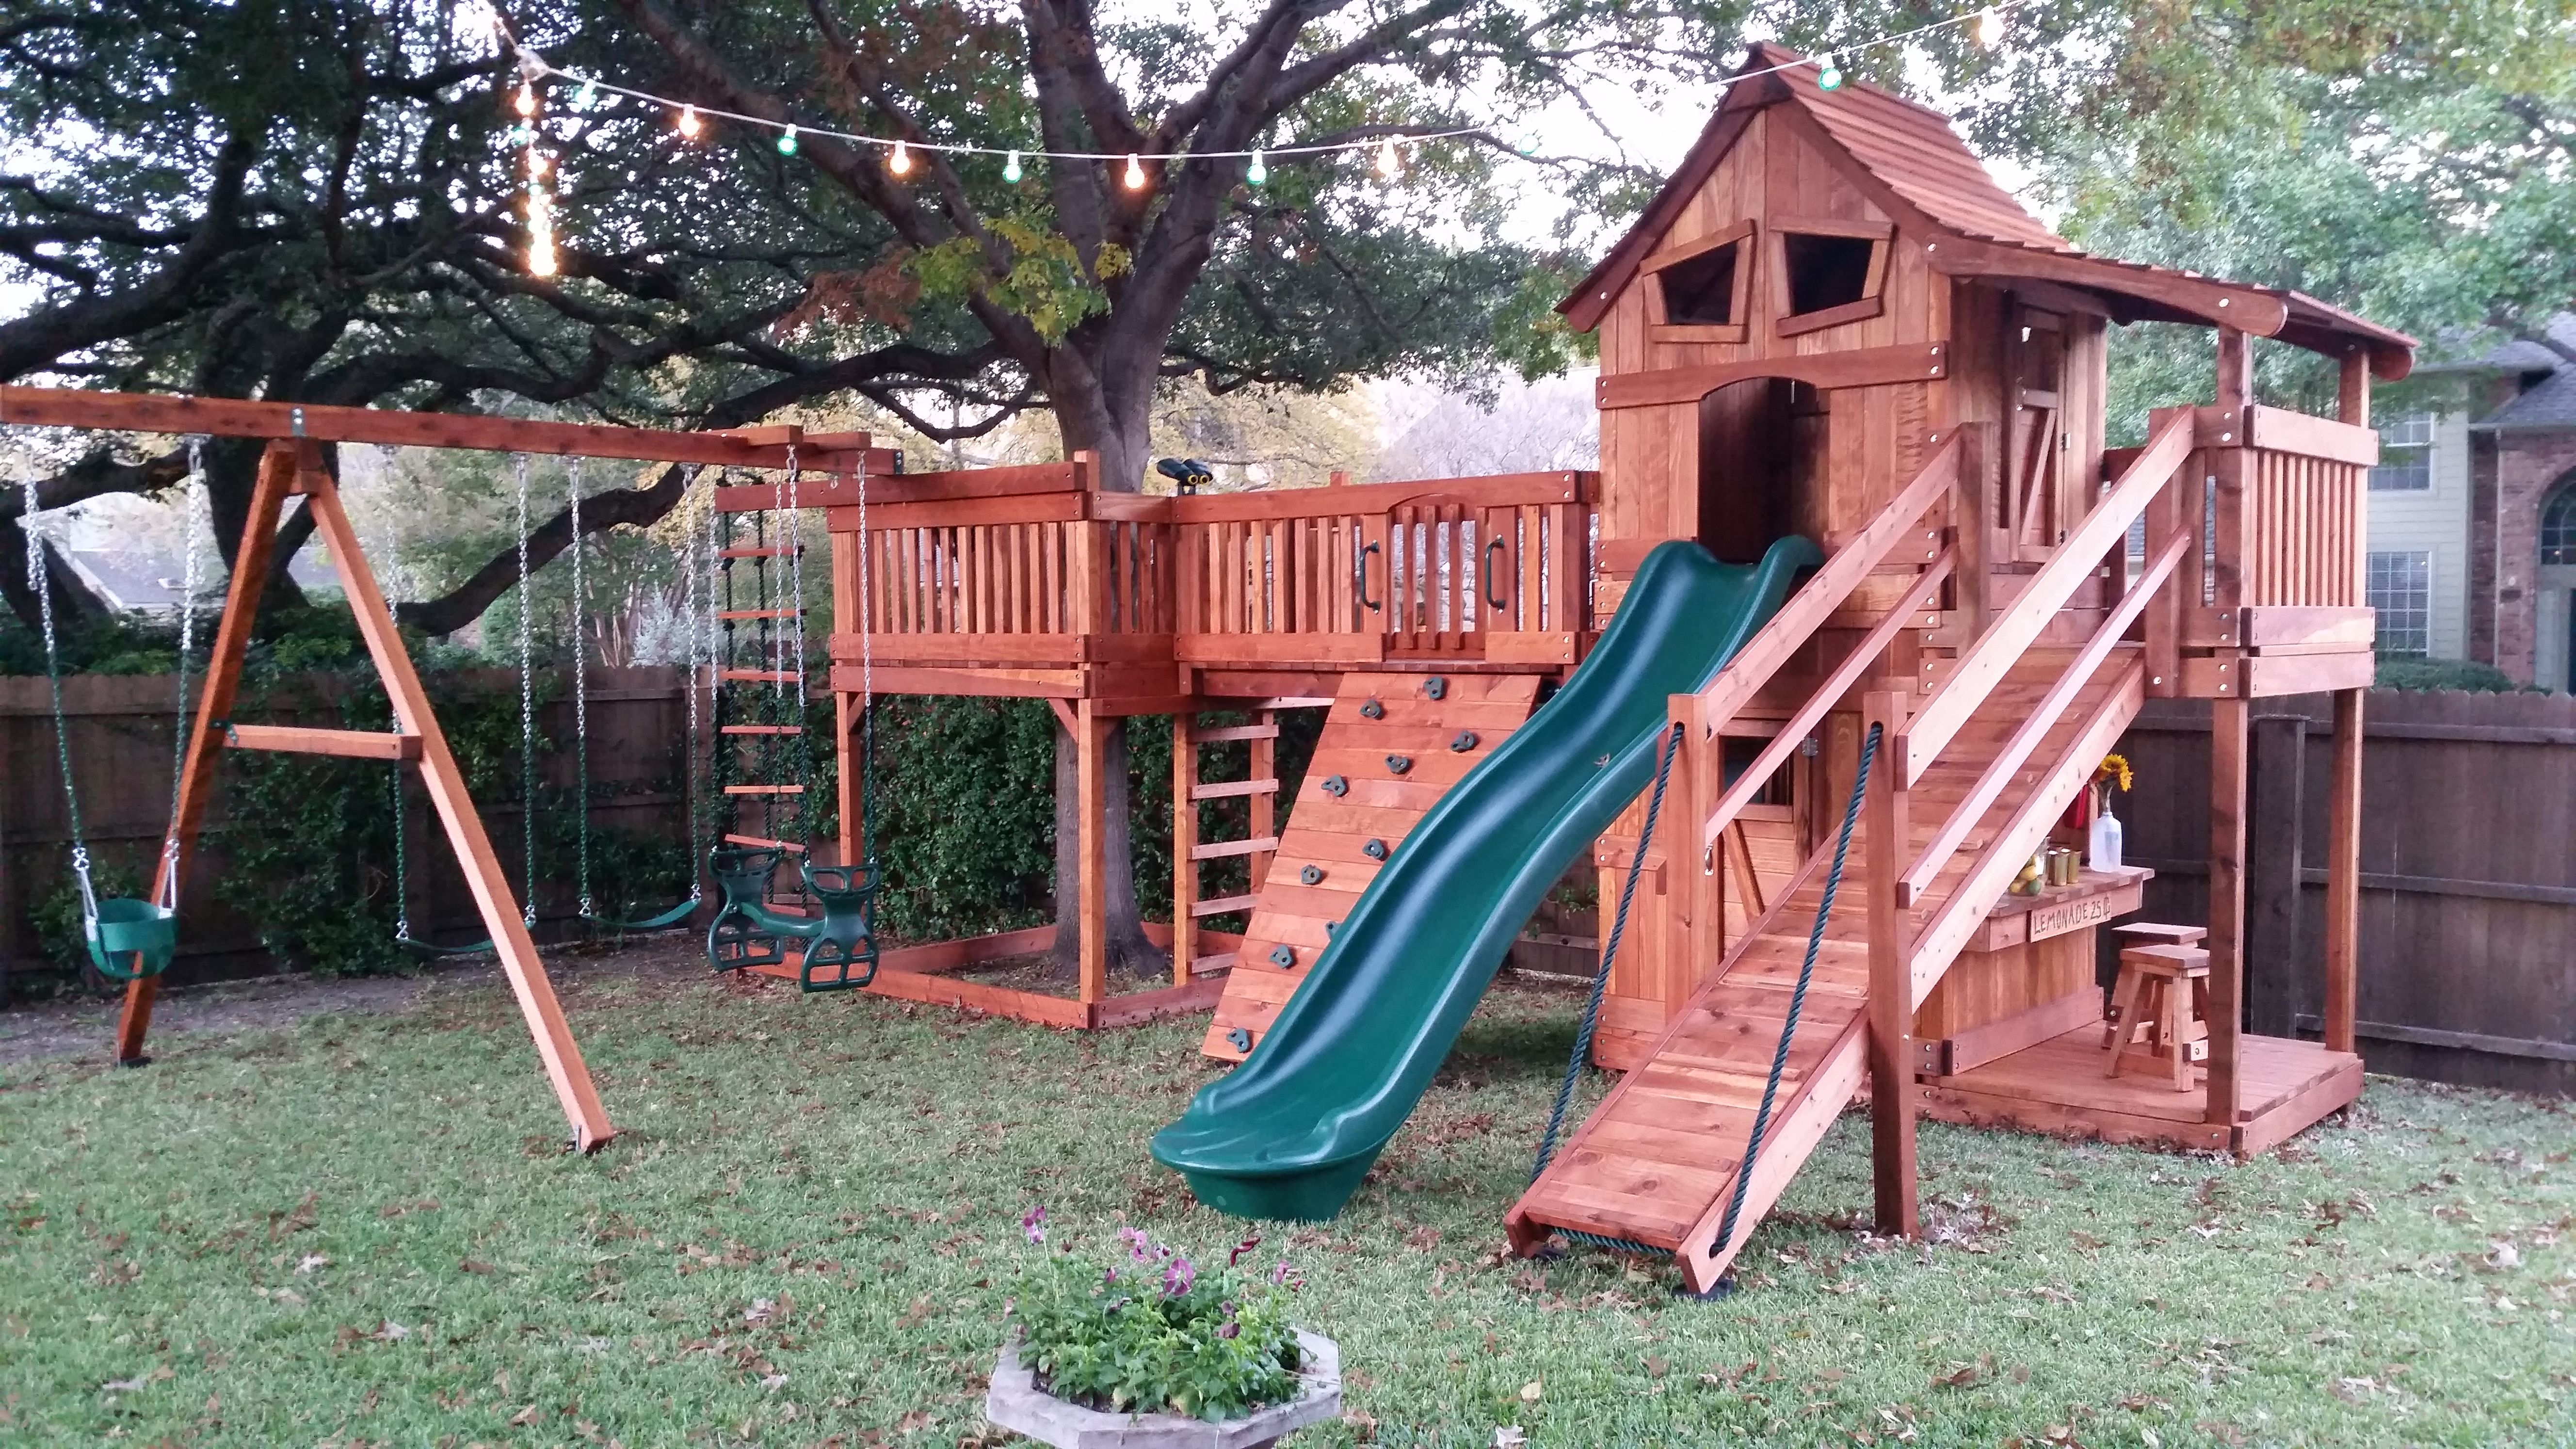 backyard treehouse outdoorliving outdoorlife outdoor wooden